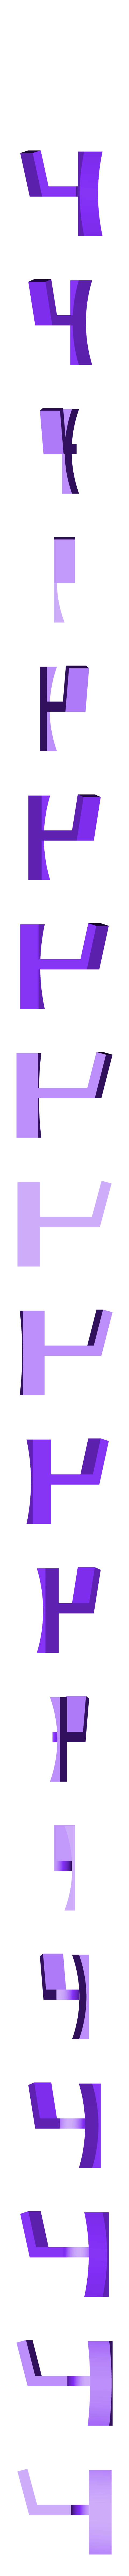 Arm_Thumb.stl Download free STL file Impatience, Motorized • 3D printer object, gzumwalt